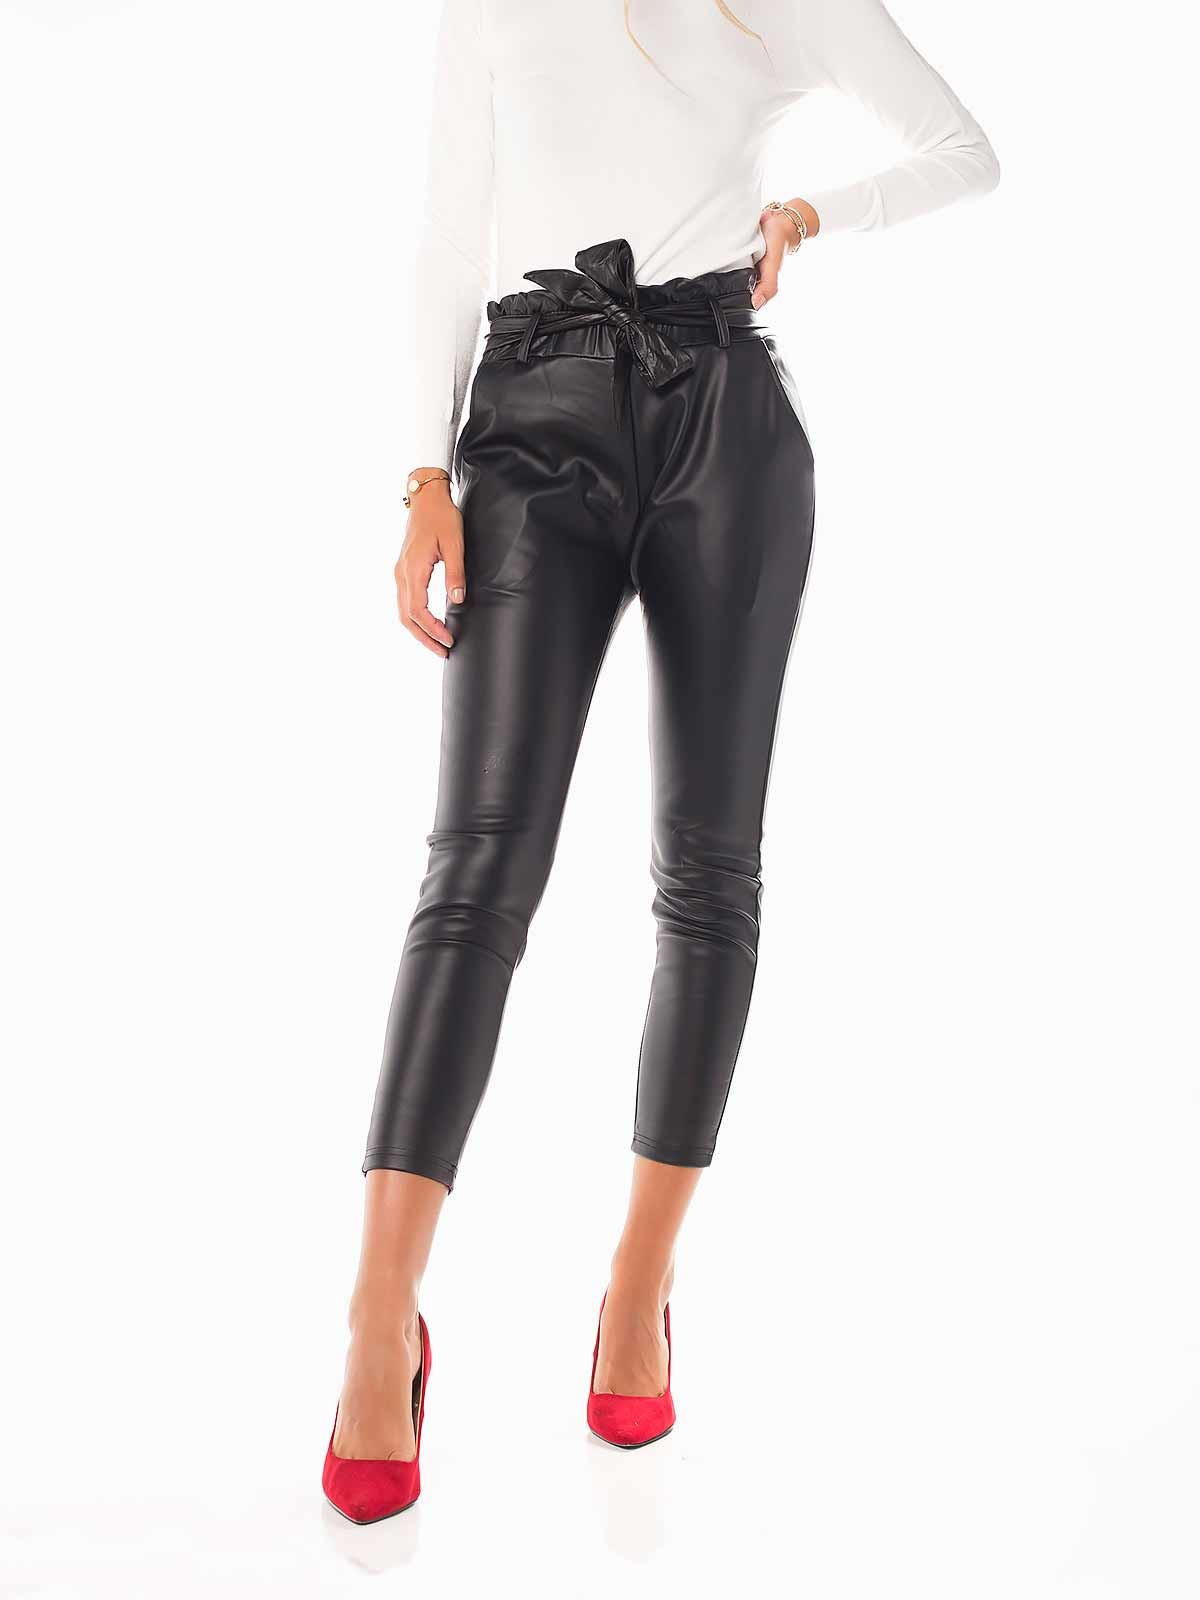 Pantalones negros de piel sintética